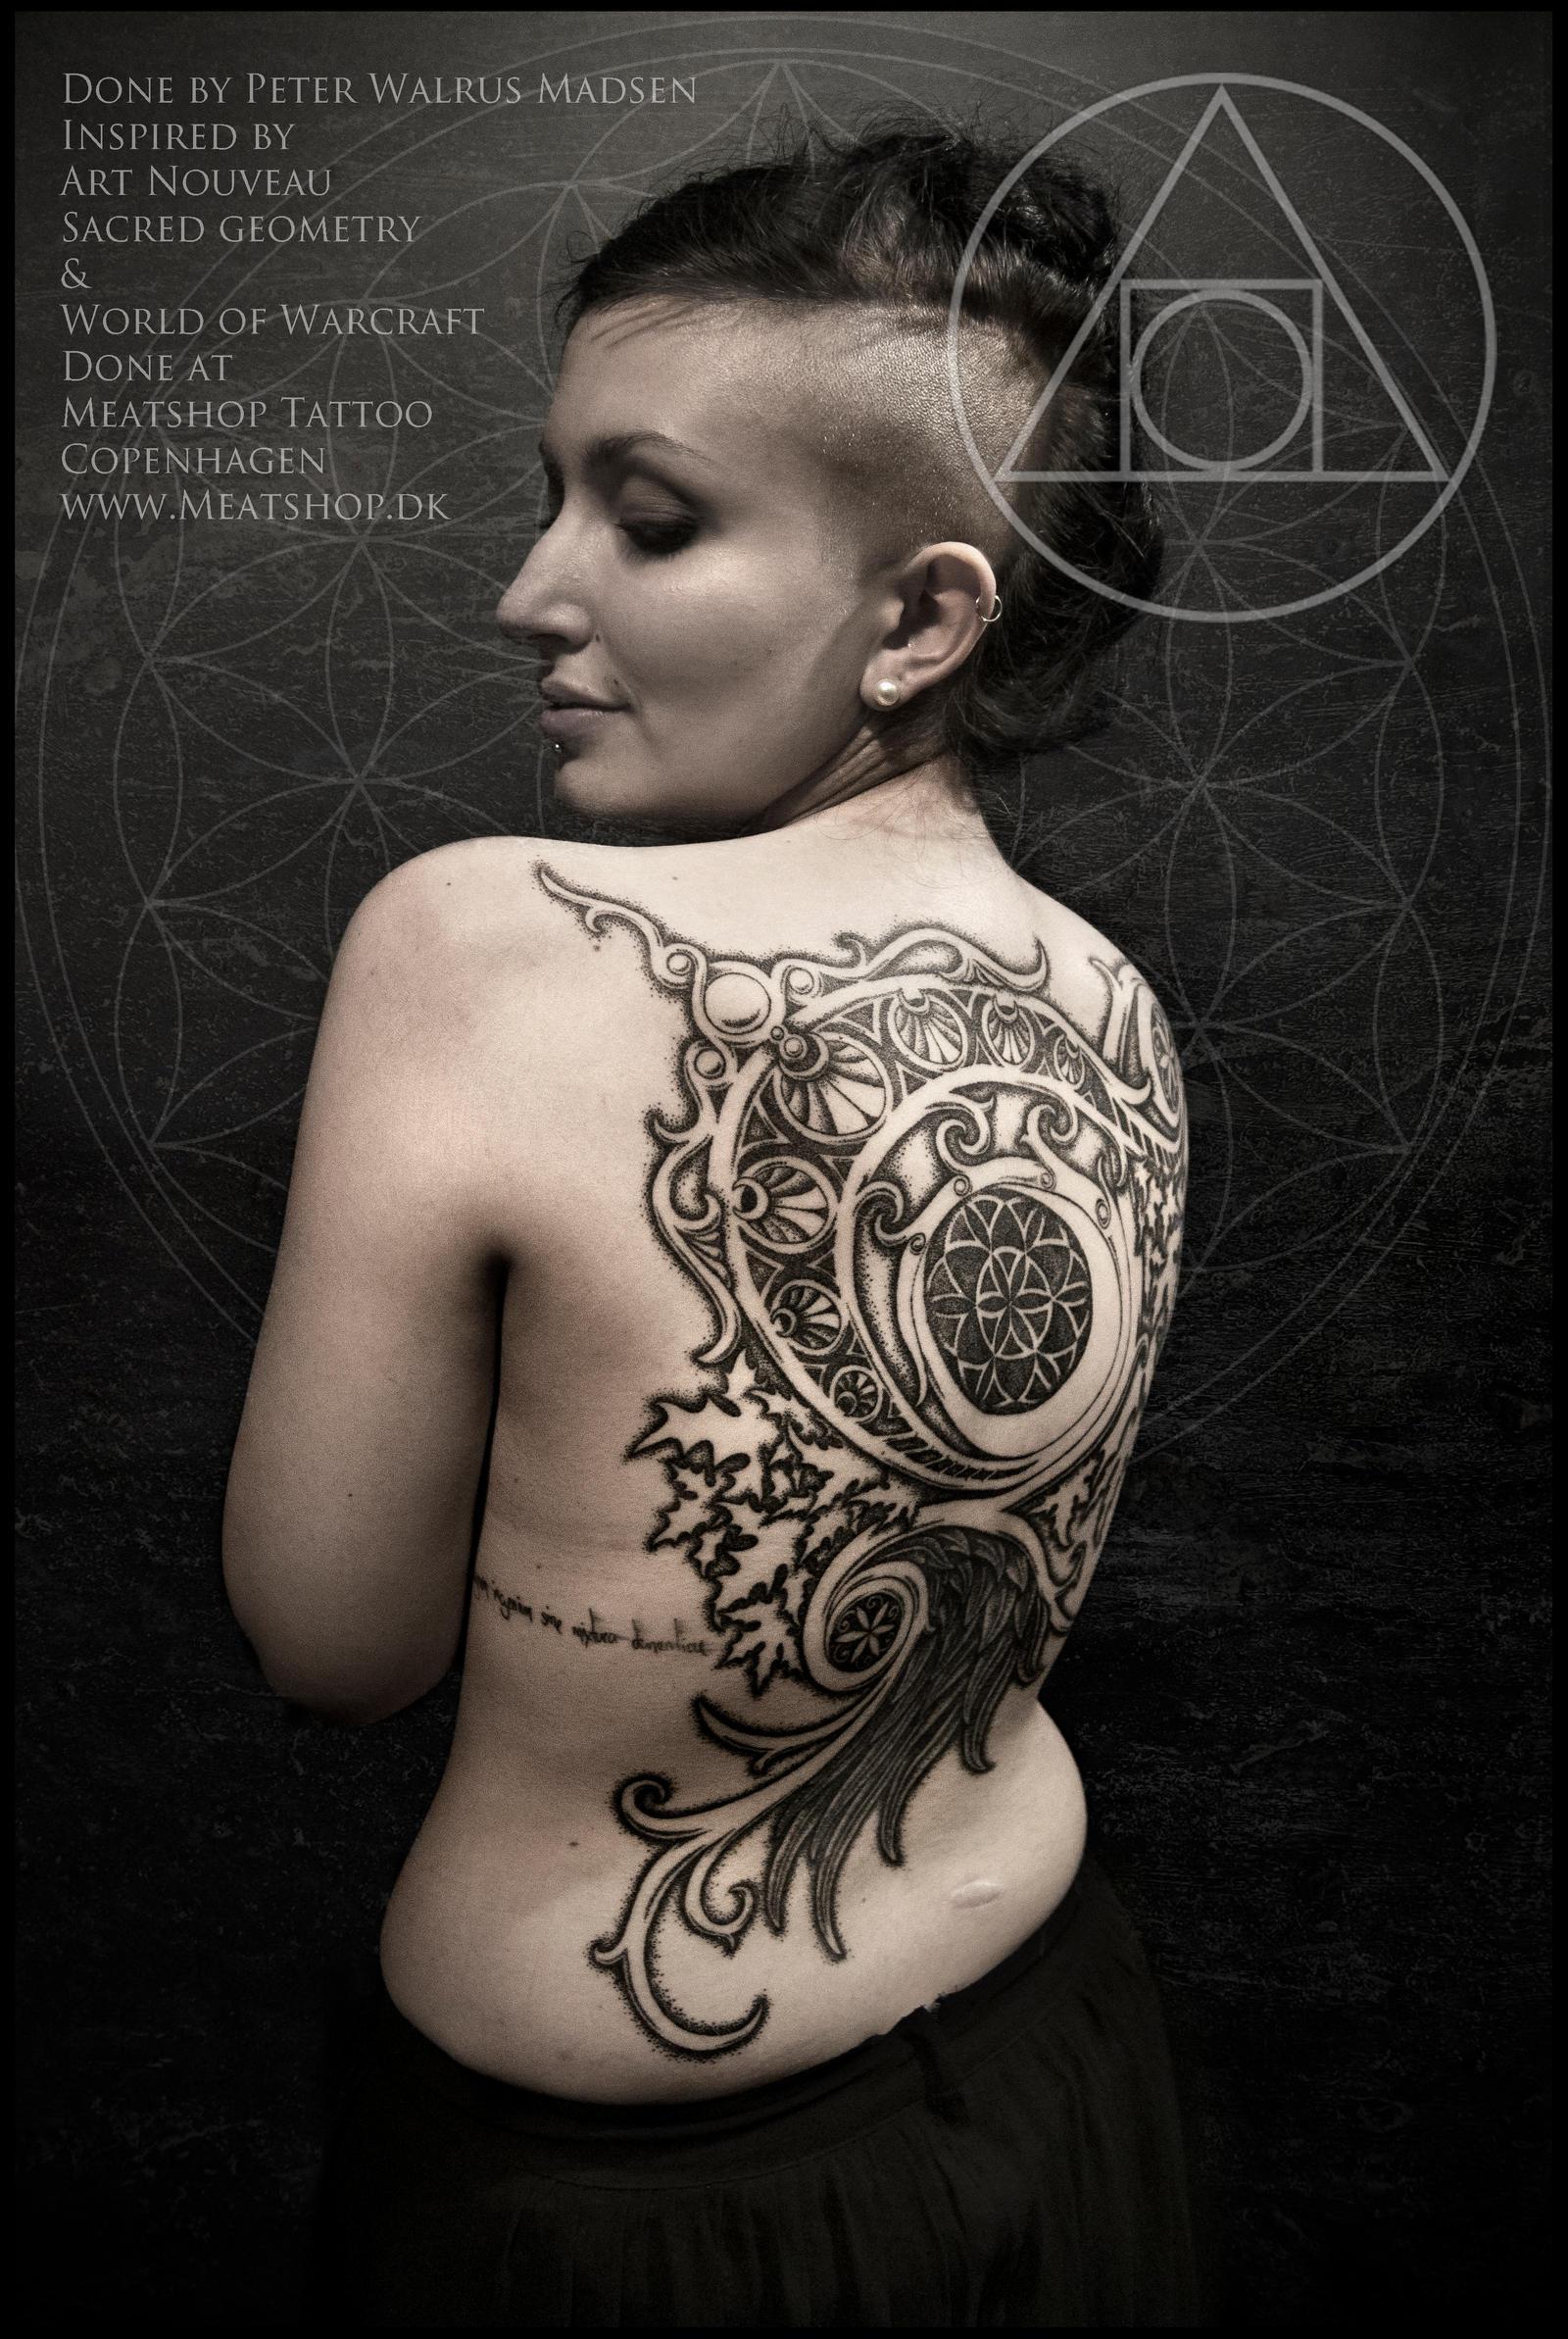 world of warcraft moongoddess tattoo pro shot by meatshop tattoo on deviantart. Black Bedroom Furniture Sets. Home Design Ideas